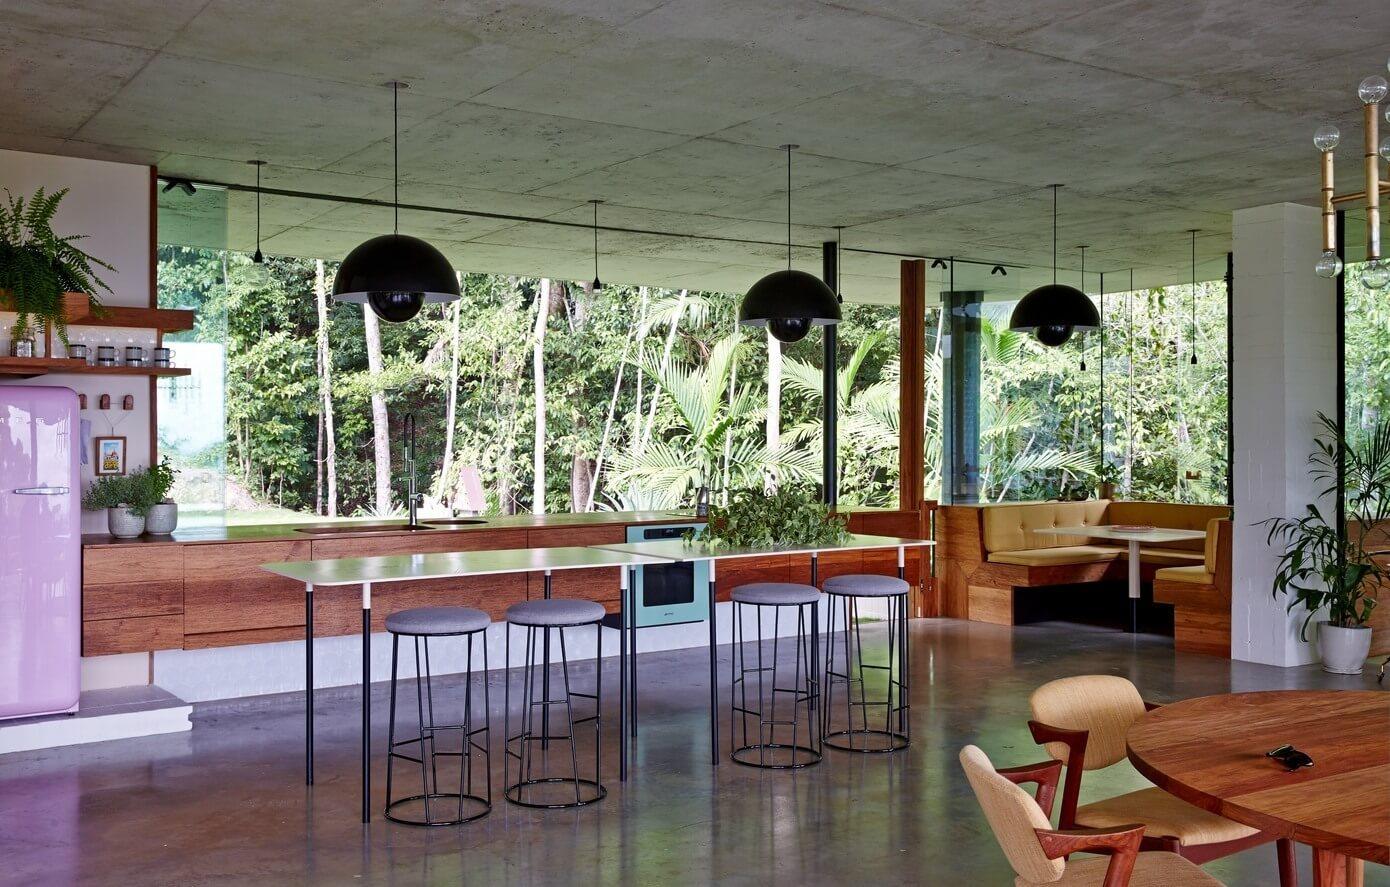 planchonella-house-jesse-bennett-architect-04